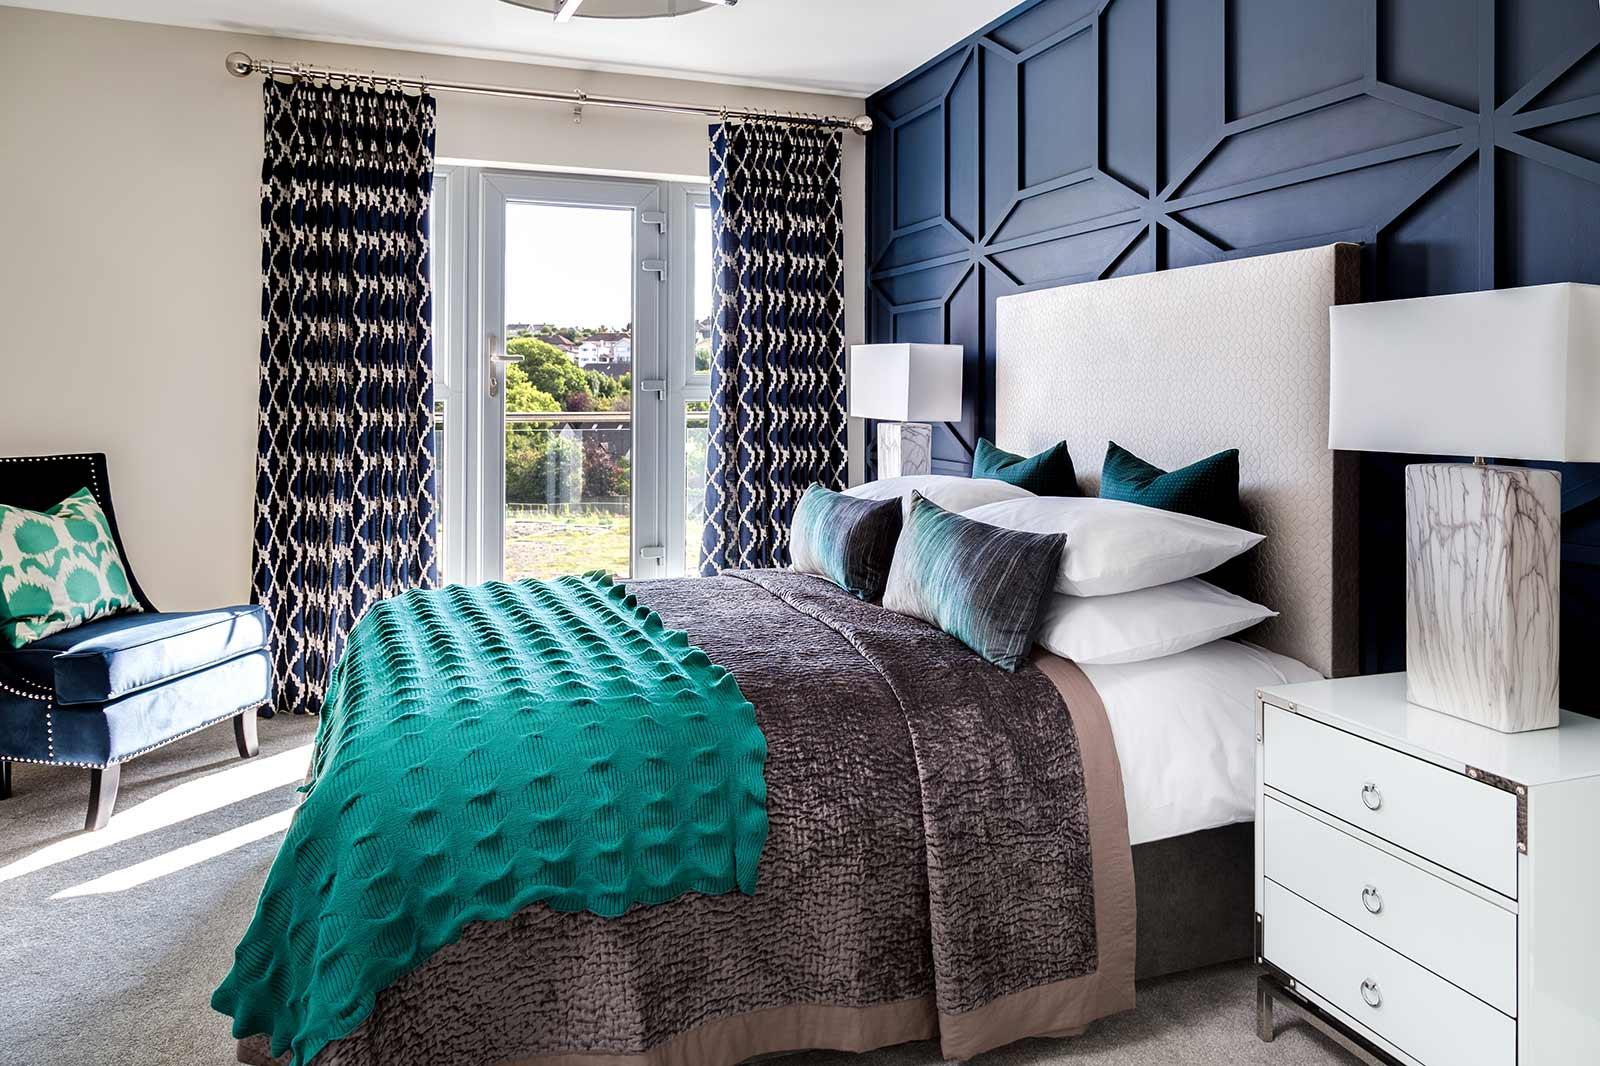 Carton-Interiors_P4_6_Bedroom